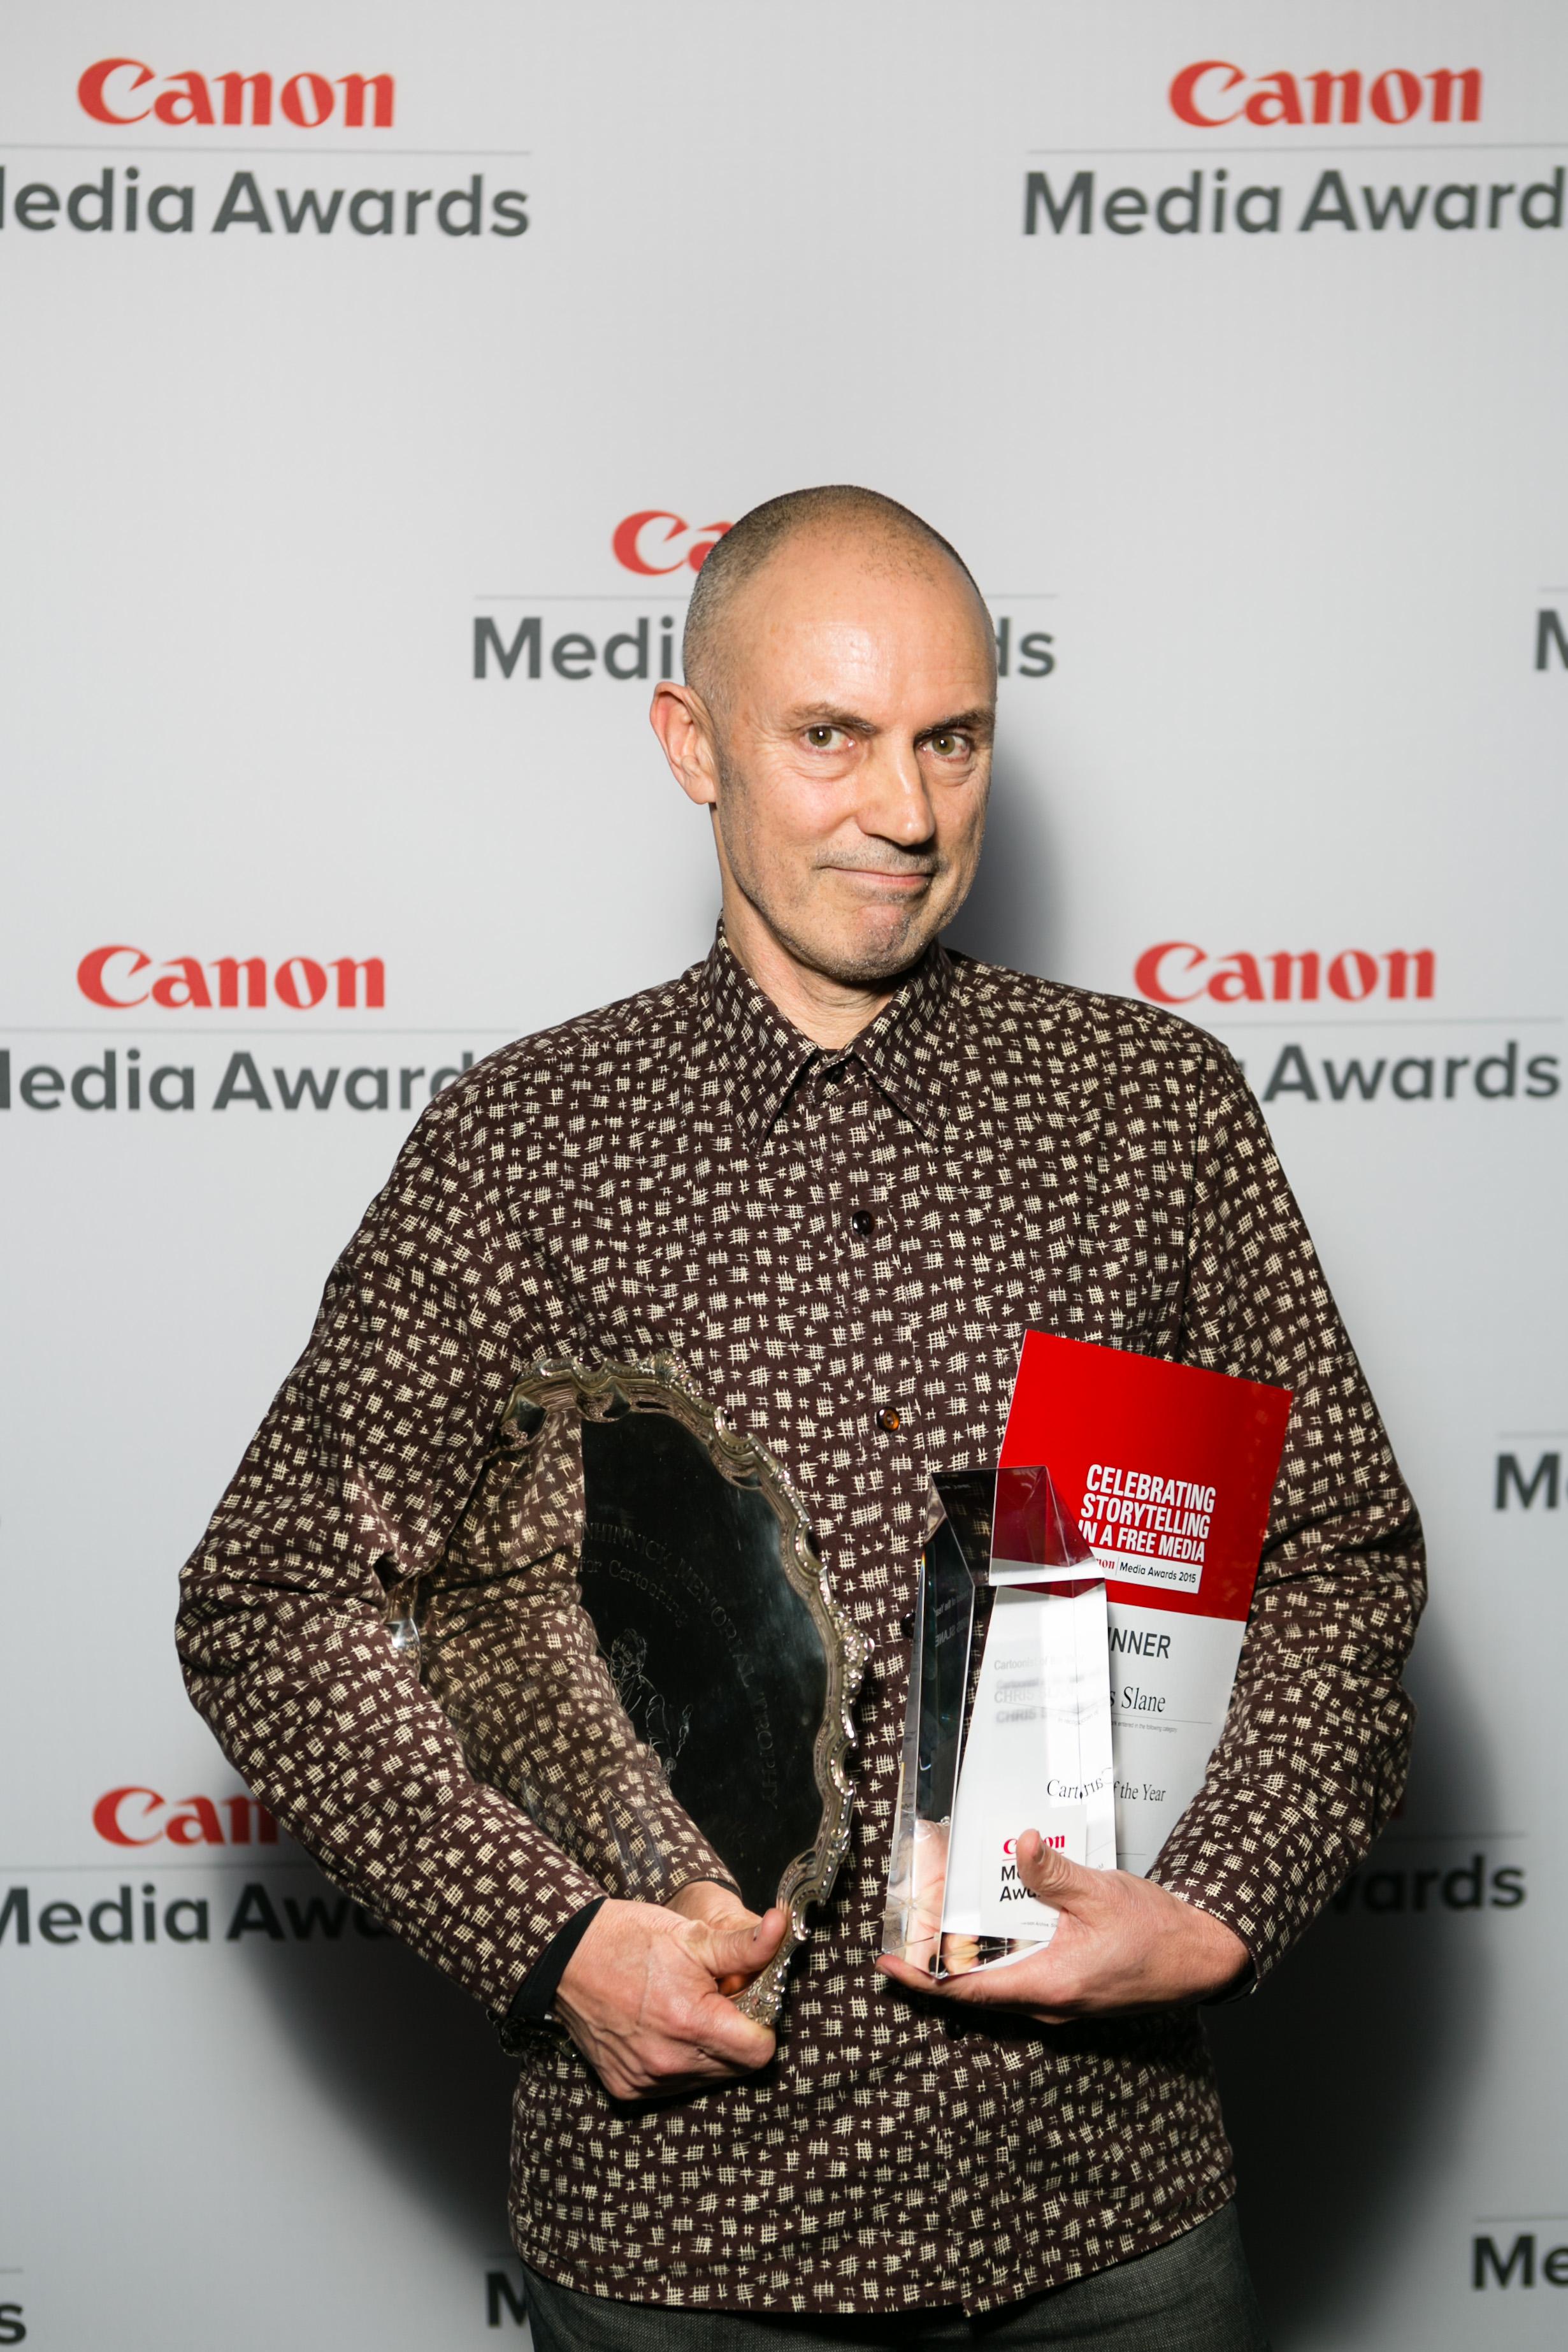 canon_media_awards_2015_interlike_nz_clinton_tudor-5871-170.jpg